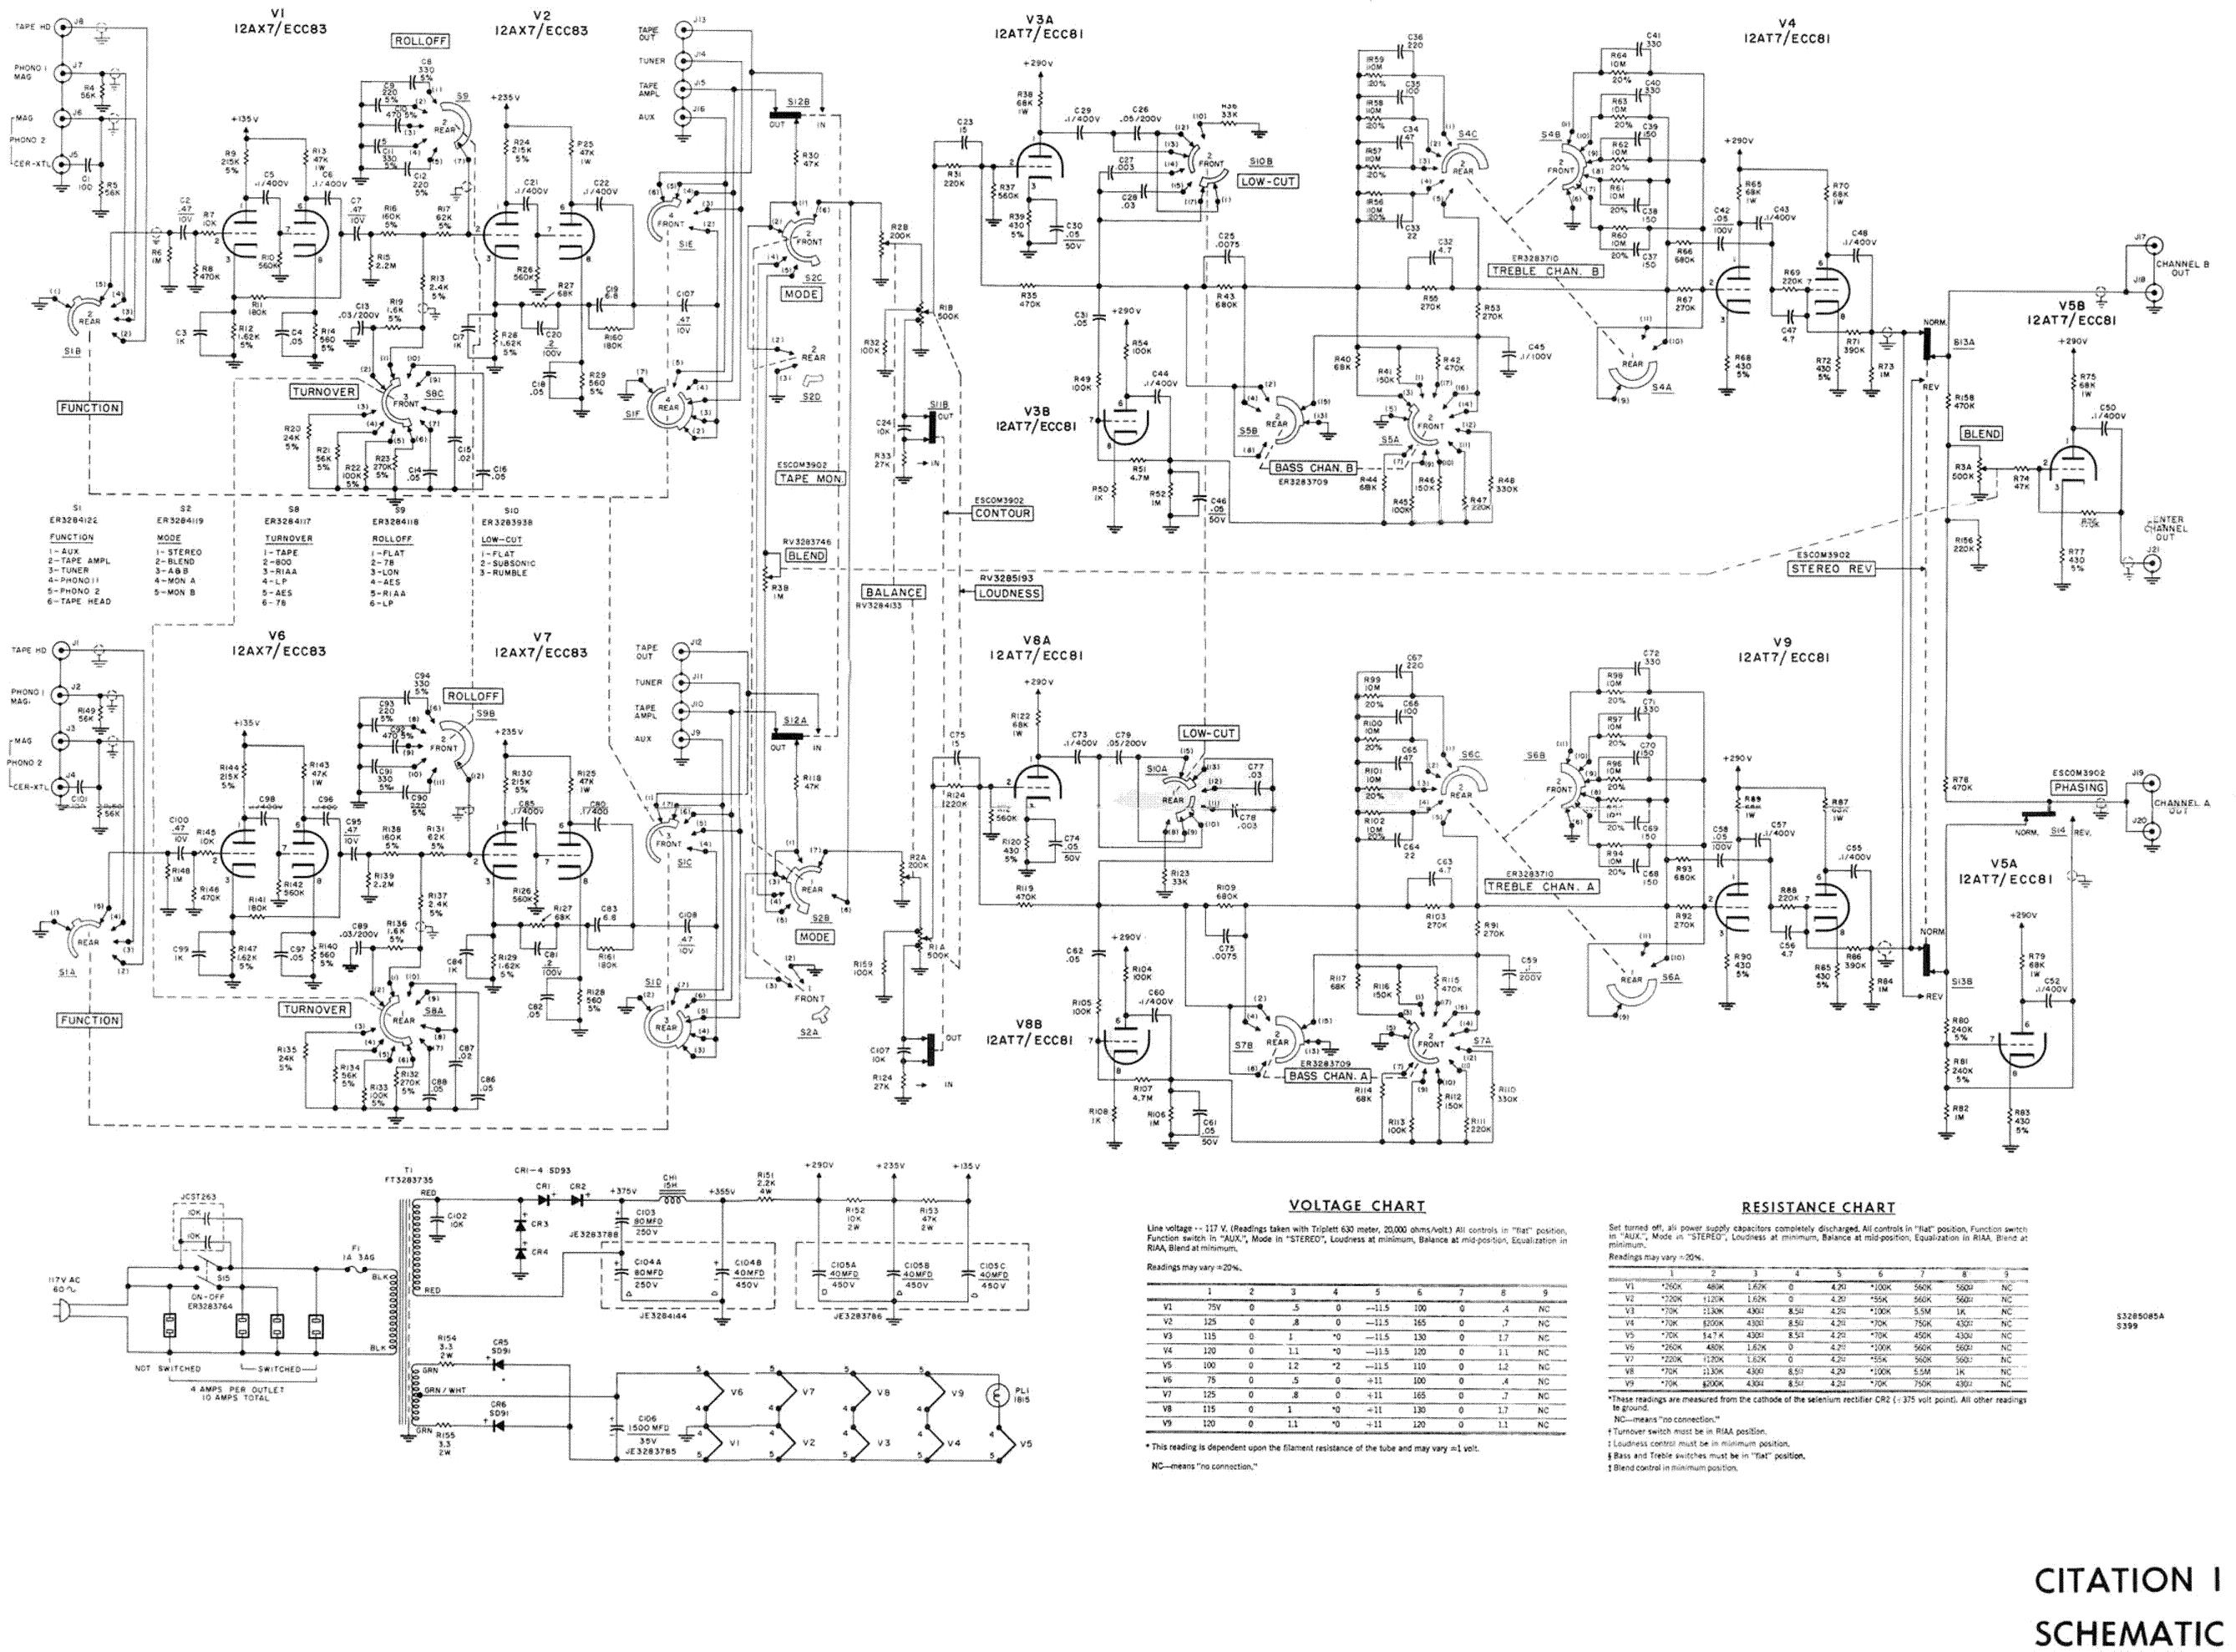 Harman Kardon Schematics Layout Wiring Diagrams Diagram 76160 06 Citation 1 Service Manual Download Eeprom Rh Elektrotanya Com Aura